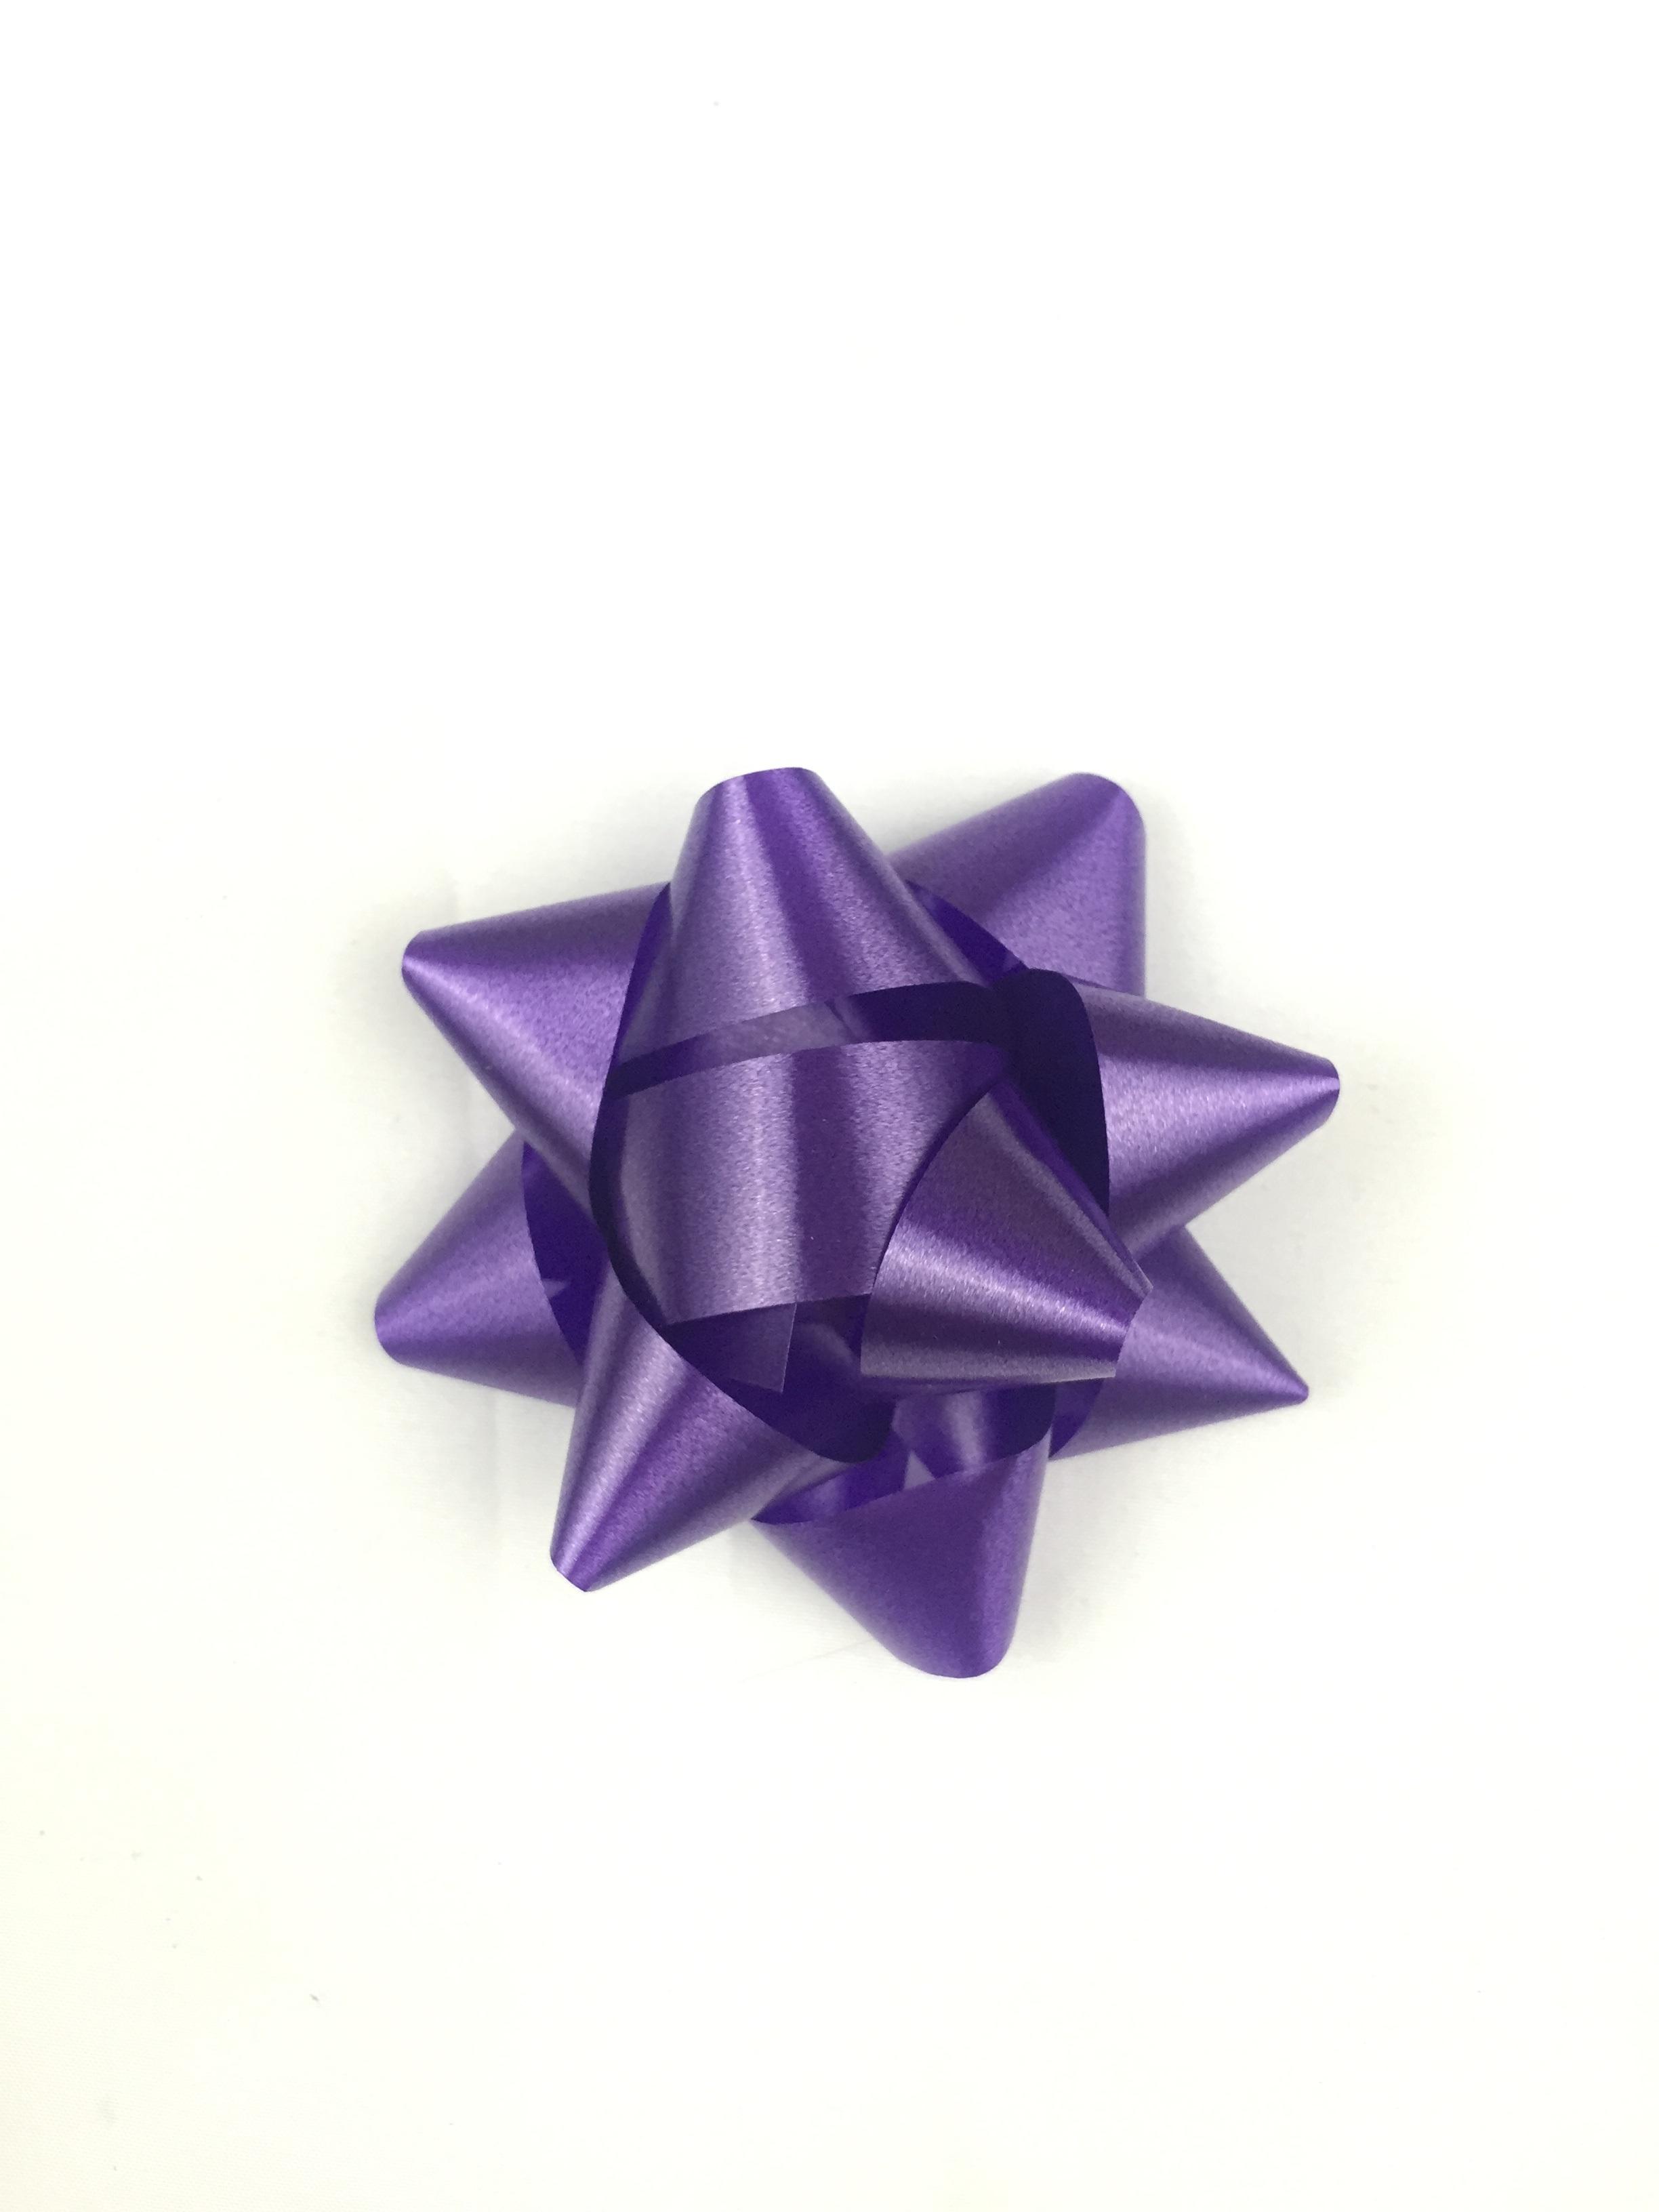 Wheel Purple Petal Celebration Gift Holiday Christmas Package Present Art Violet Bow Surprise Wrap Origami Fashion